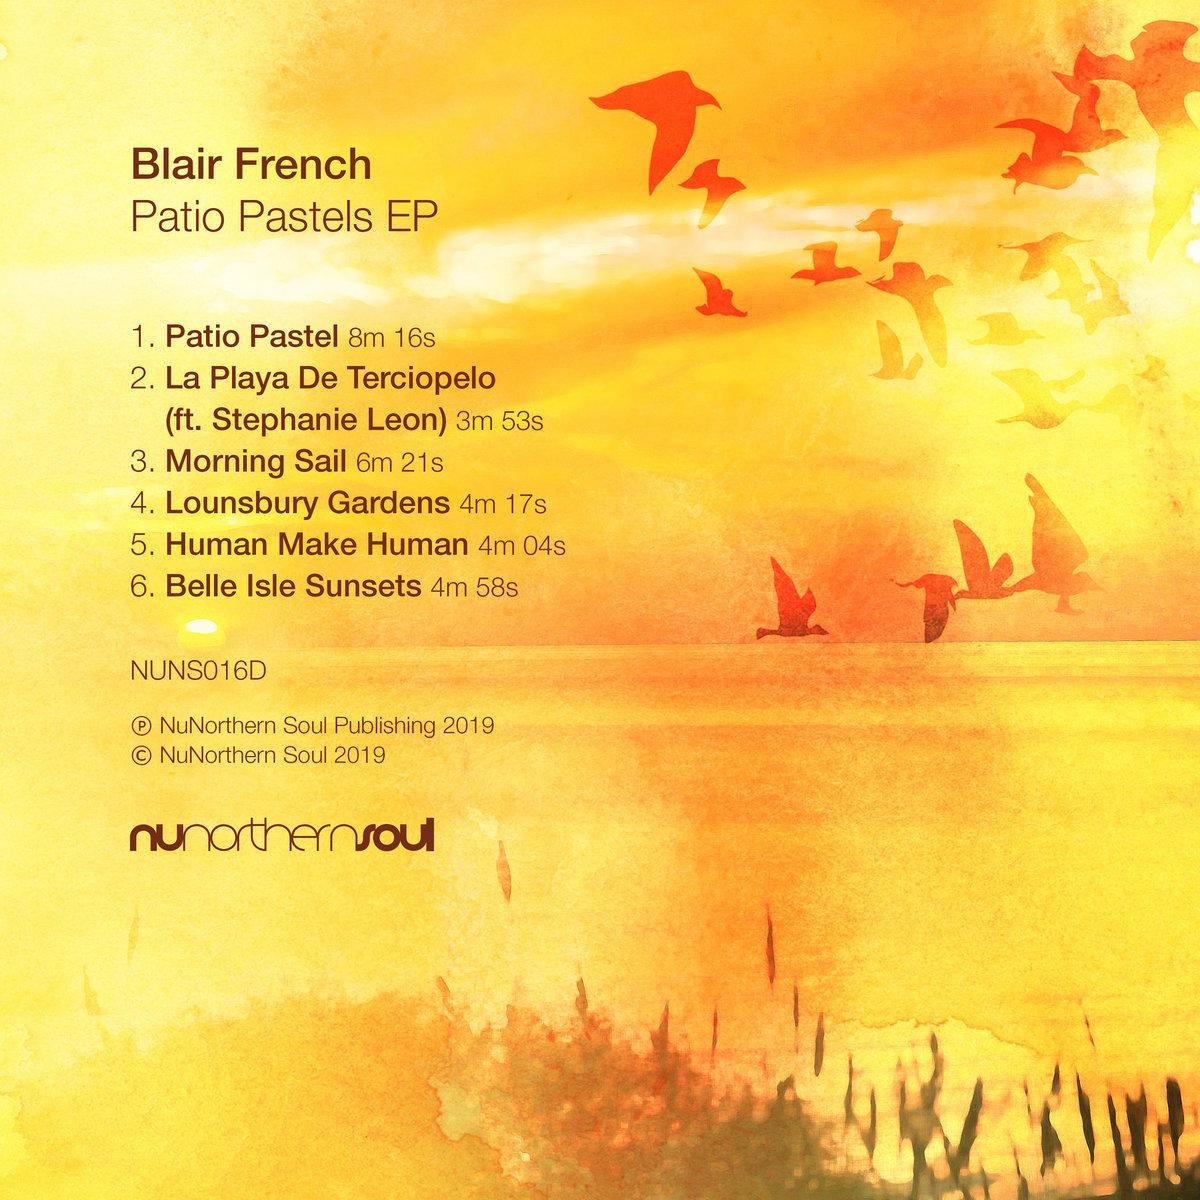 Patio Pastels Mini LP | NuNorthern Soul